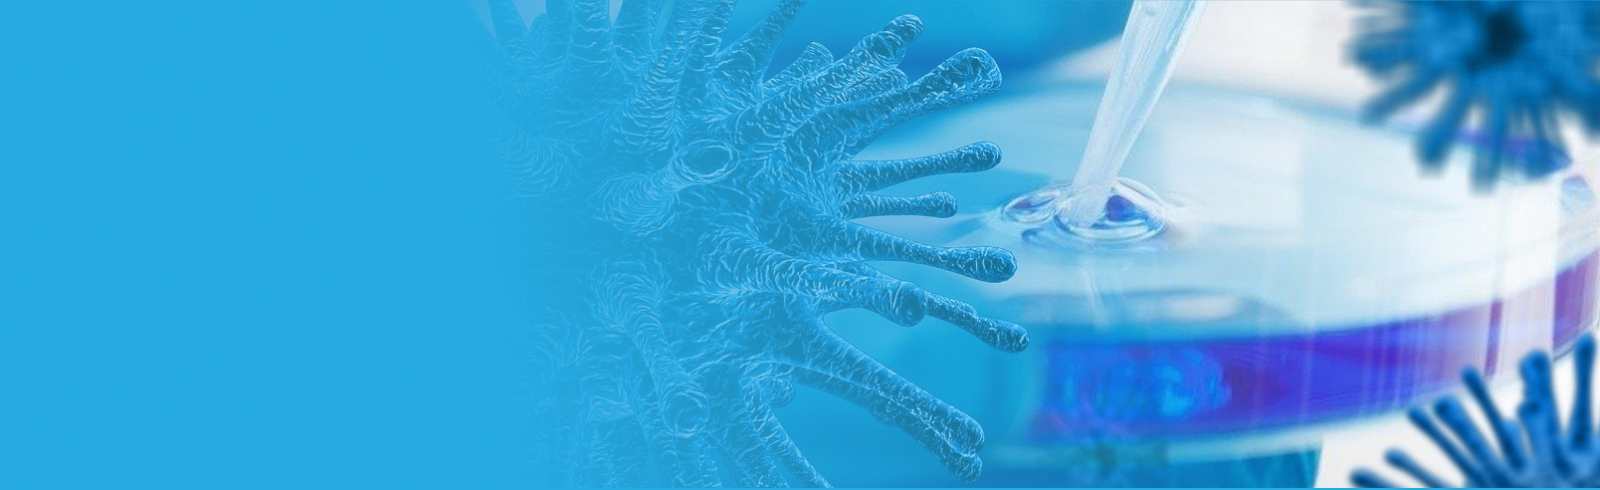 Diagnostyka SARS-CoV-2